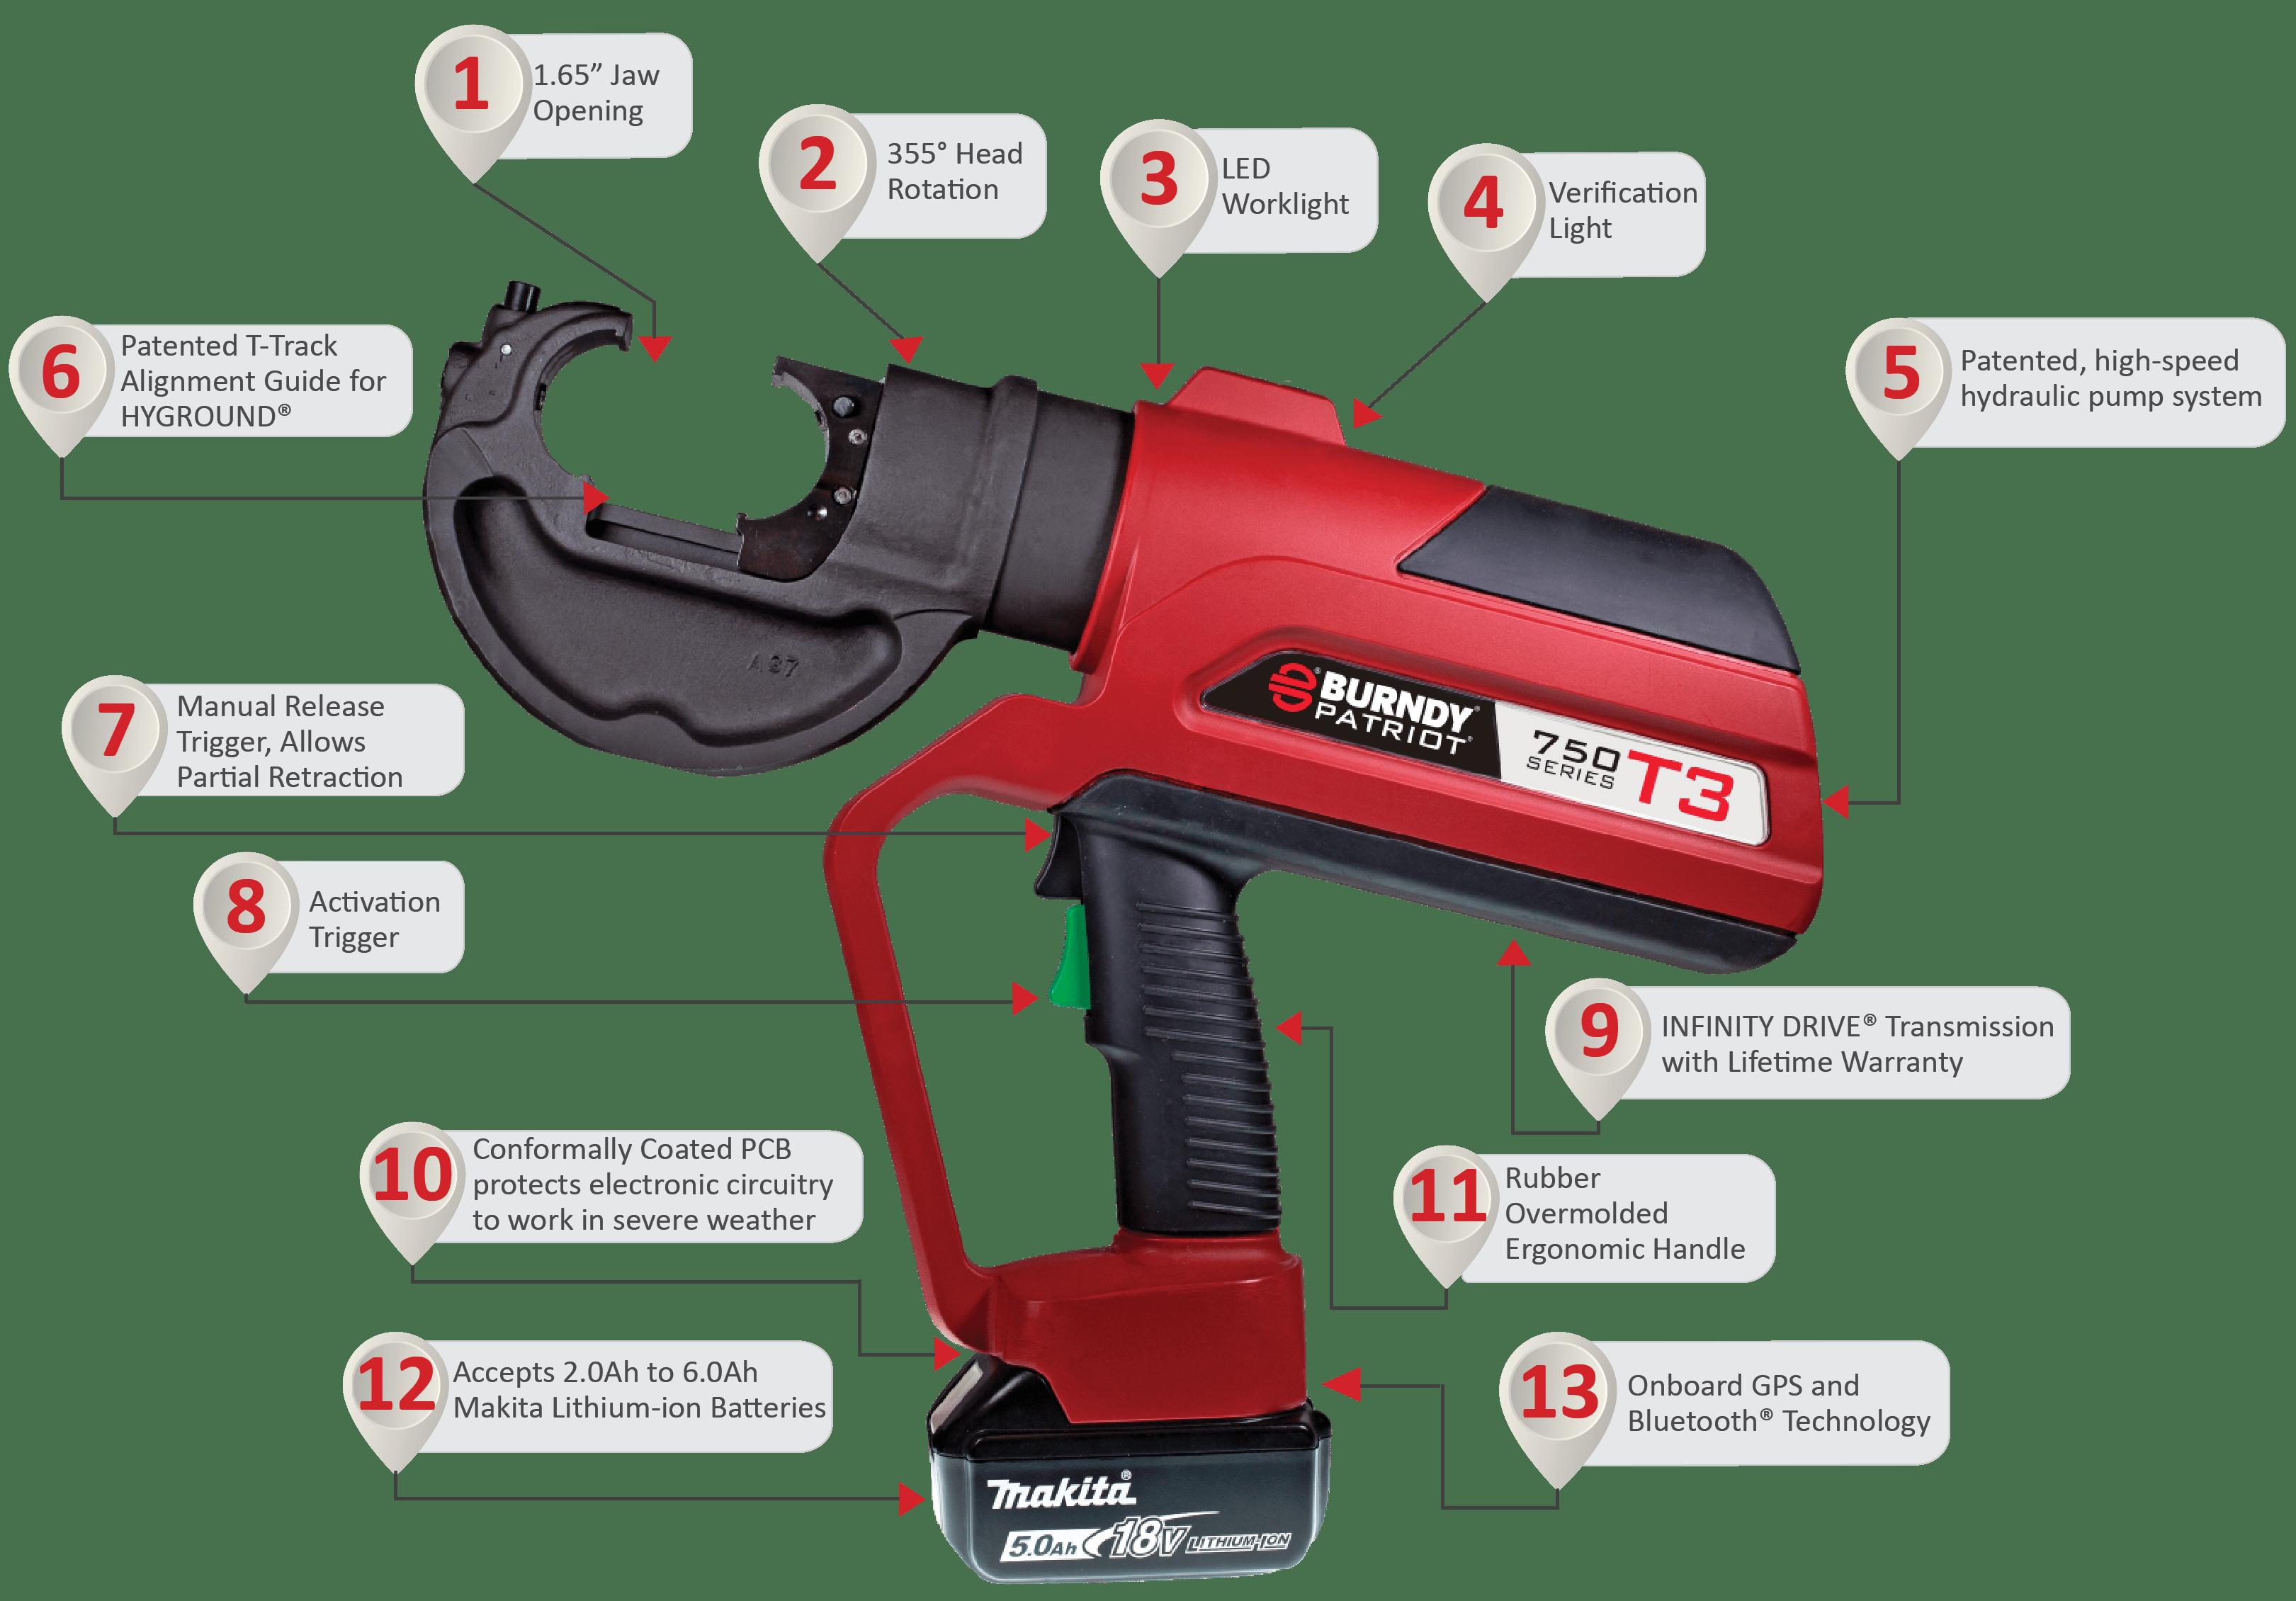 smart-crimping-tool-BURDNY-PAT750T3-features